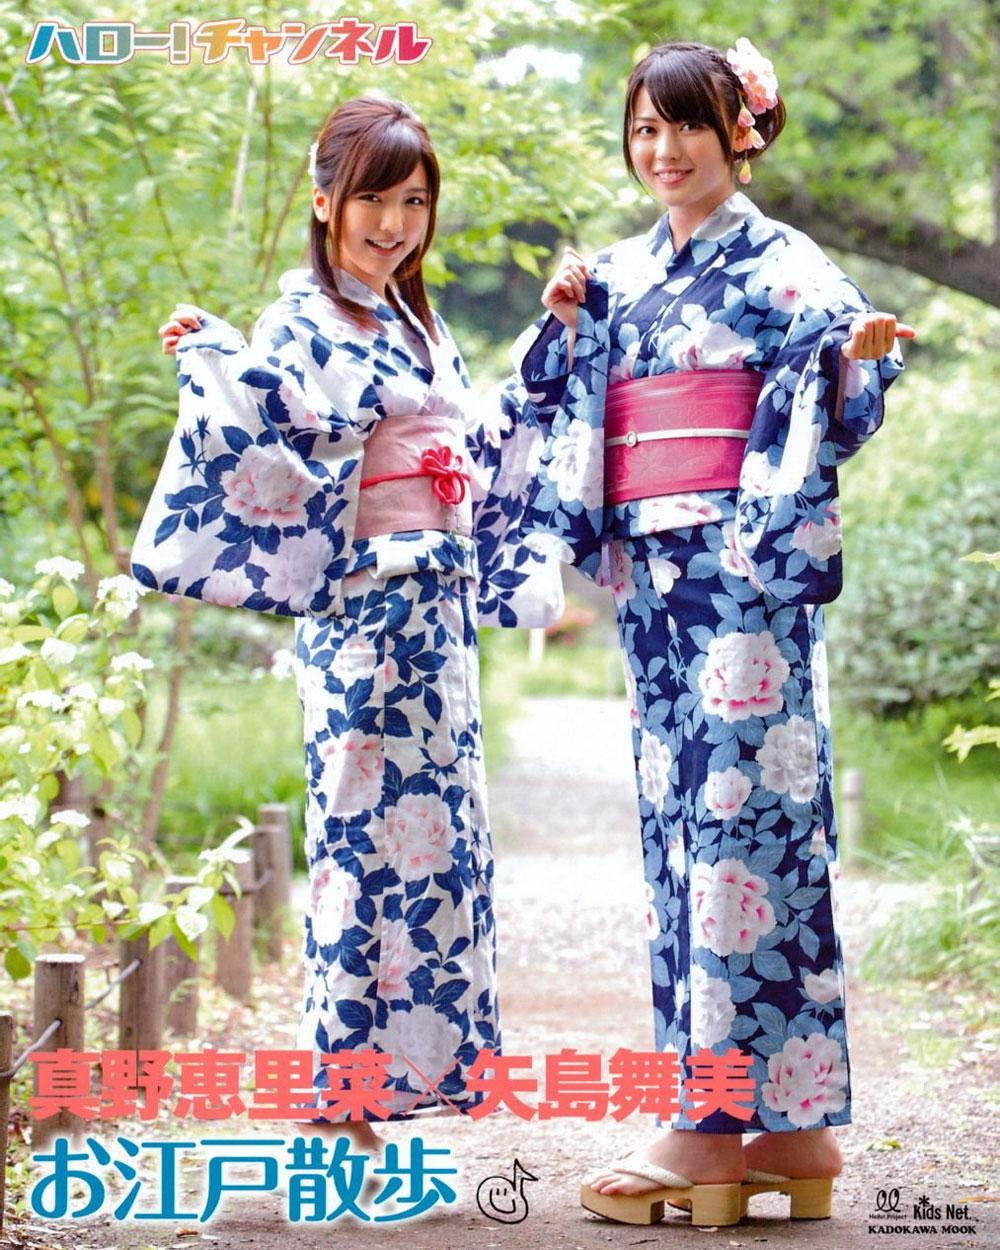 Erina Mano and Maimi Yajima in yukata